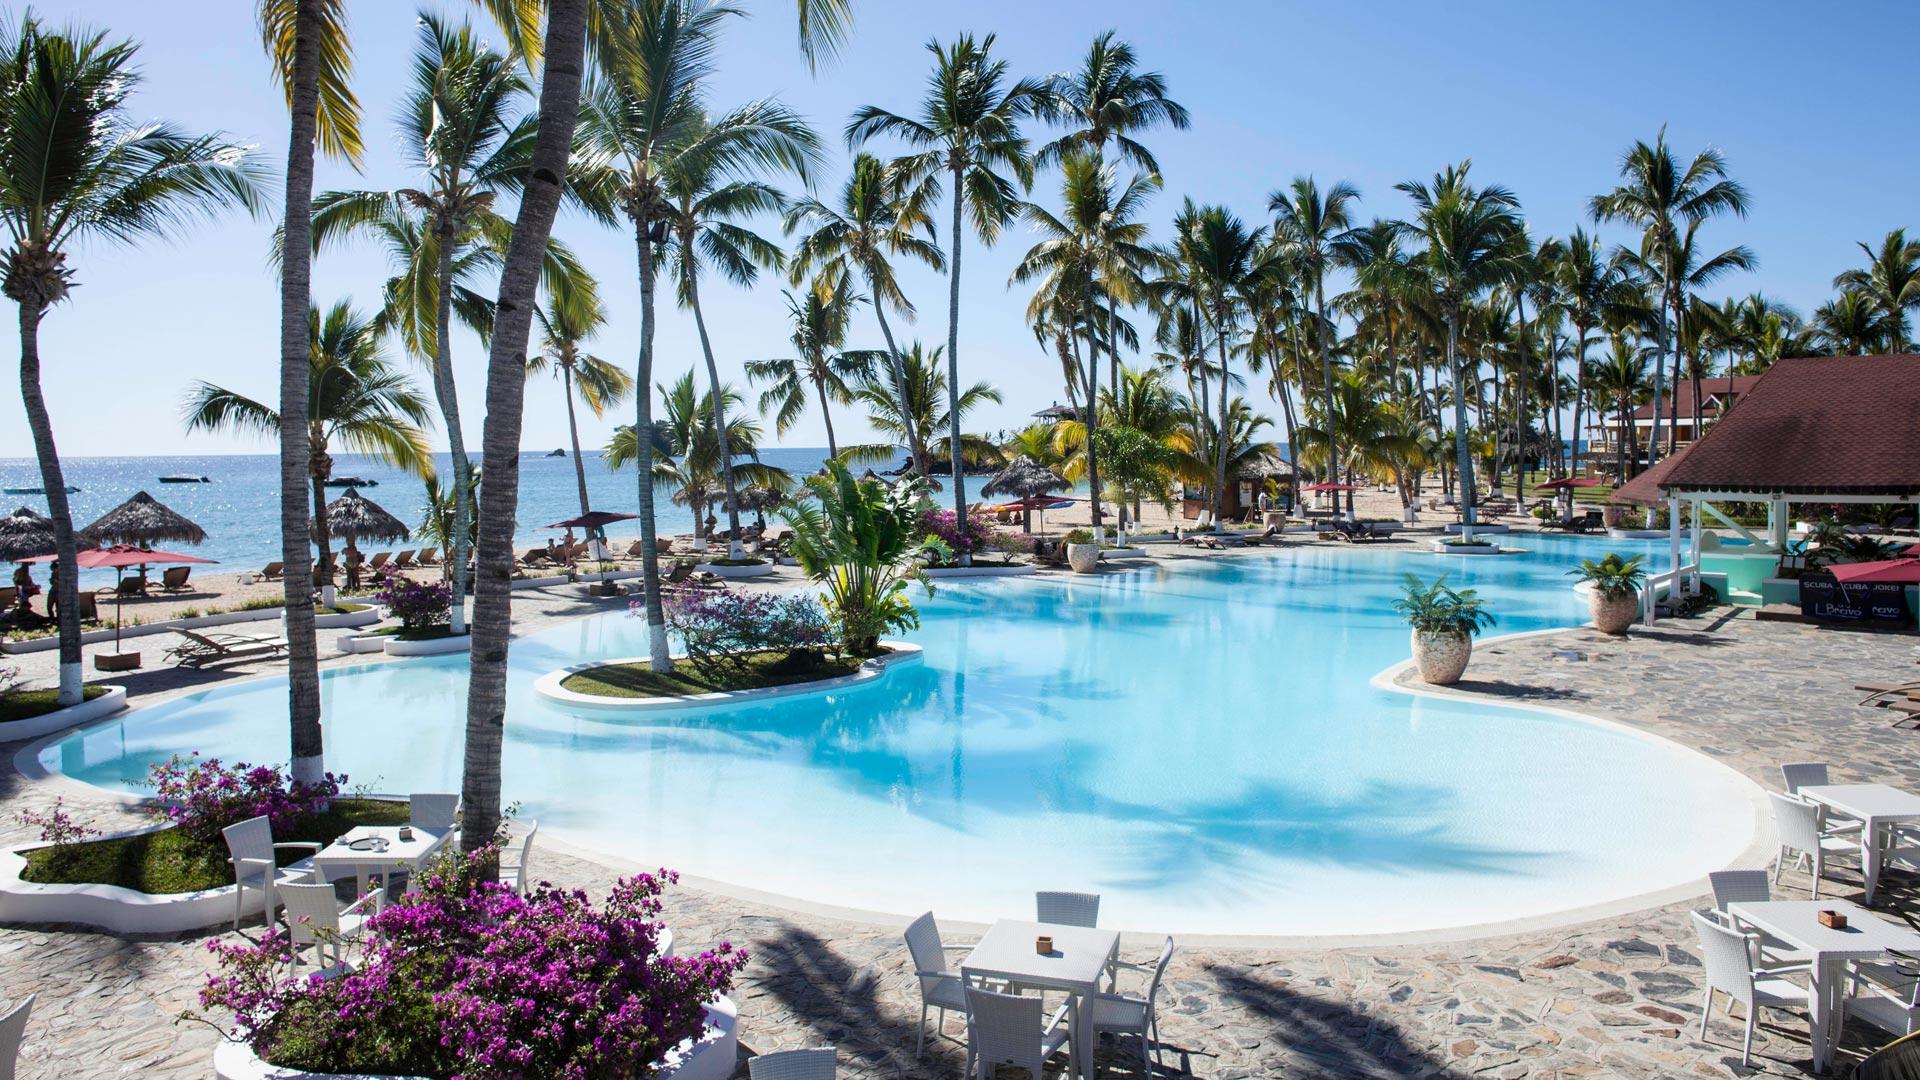 Resort avec piscine madagascar hotel piscine nosy be for Camping moustiers sainte marie avec piscine